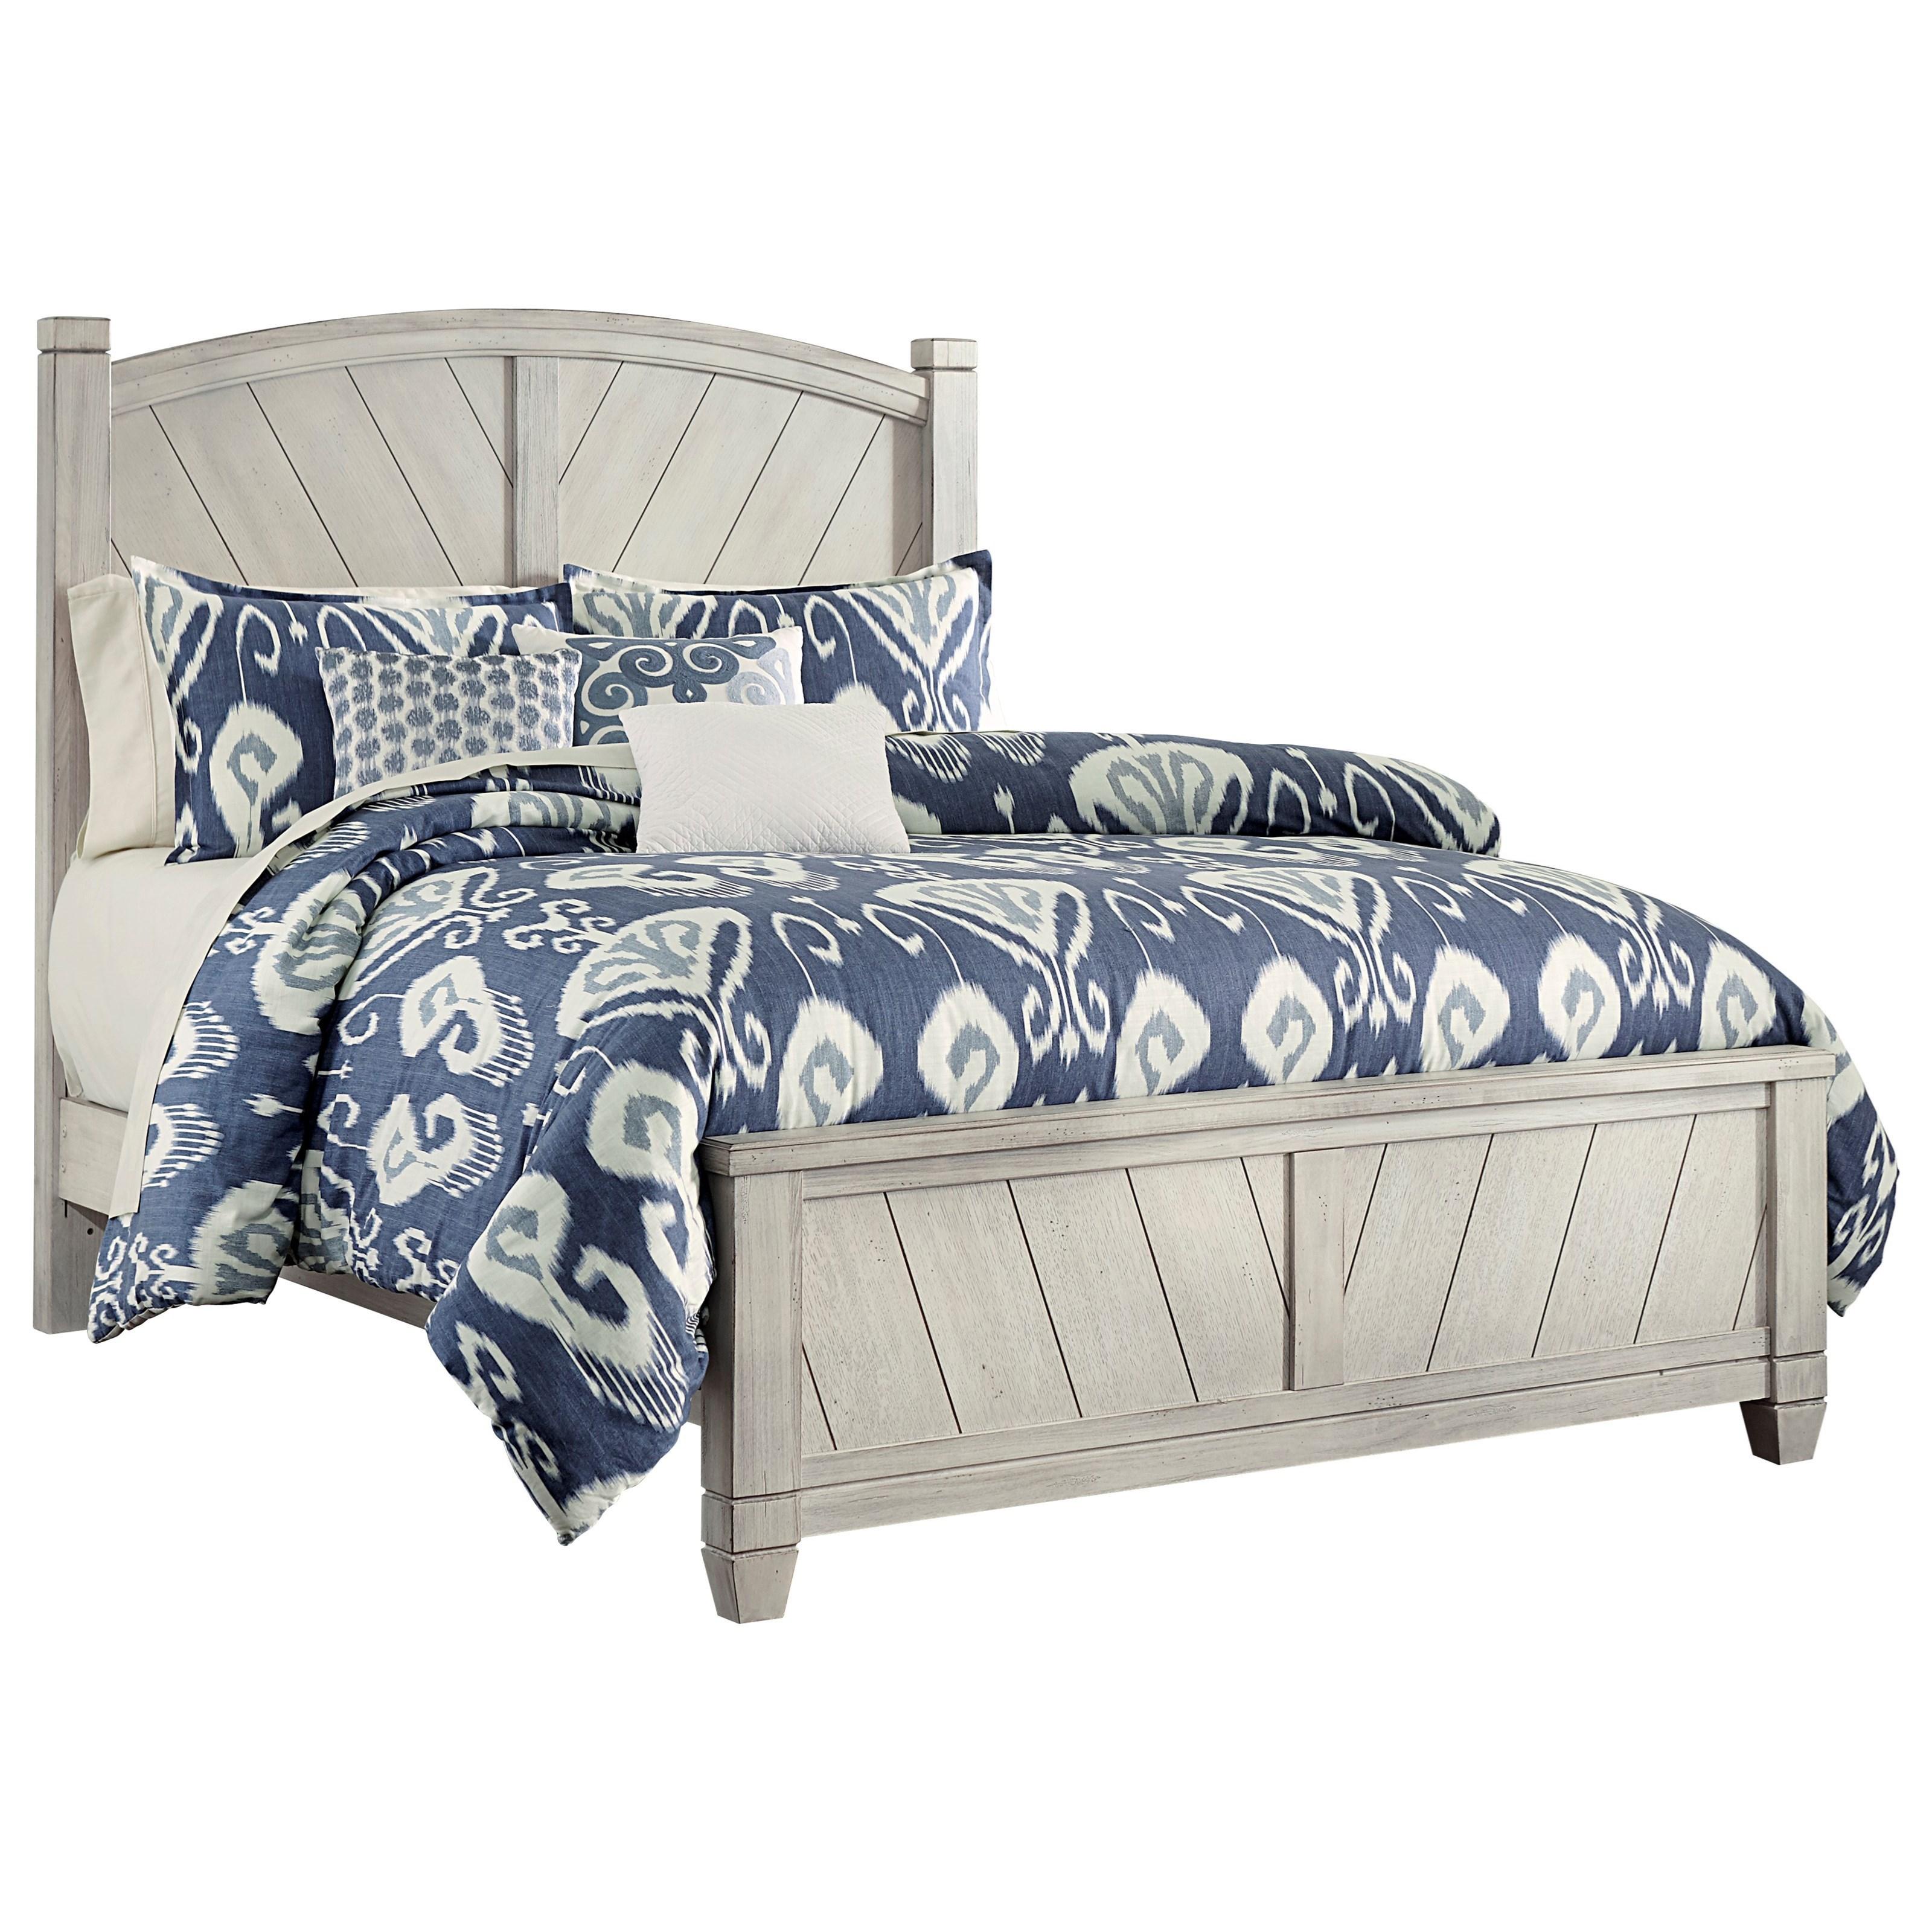 Nice Vaughan Bassett Rustic Cottage Queen Panel Bed   Item Number: 644 558+855